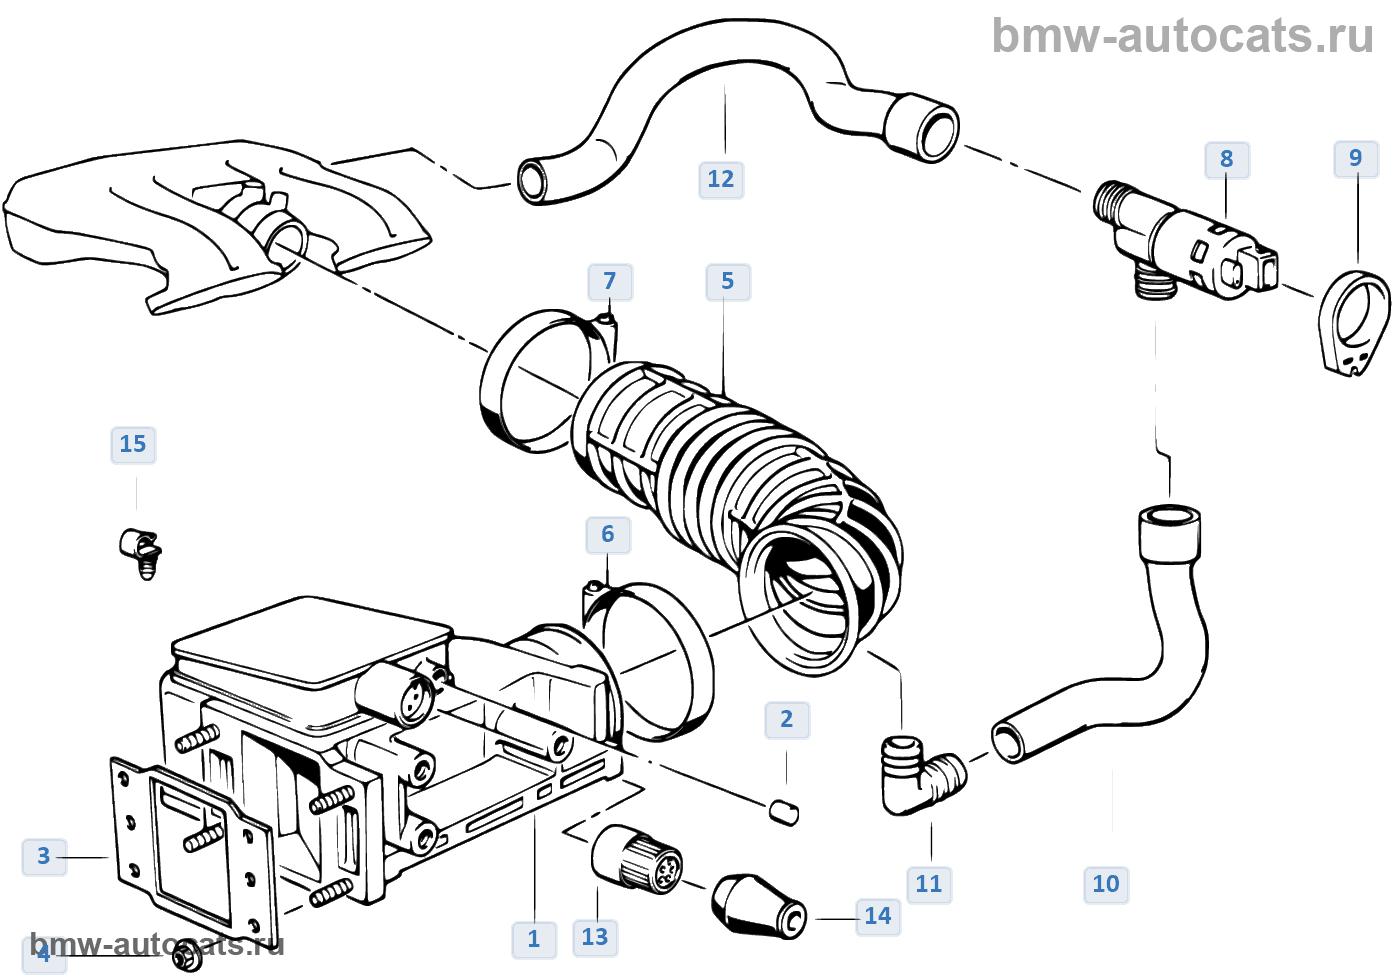 Клапан регулировки холостого хода для e36 m3 32(00071998) s50 мкпп левый